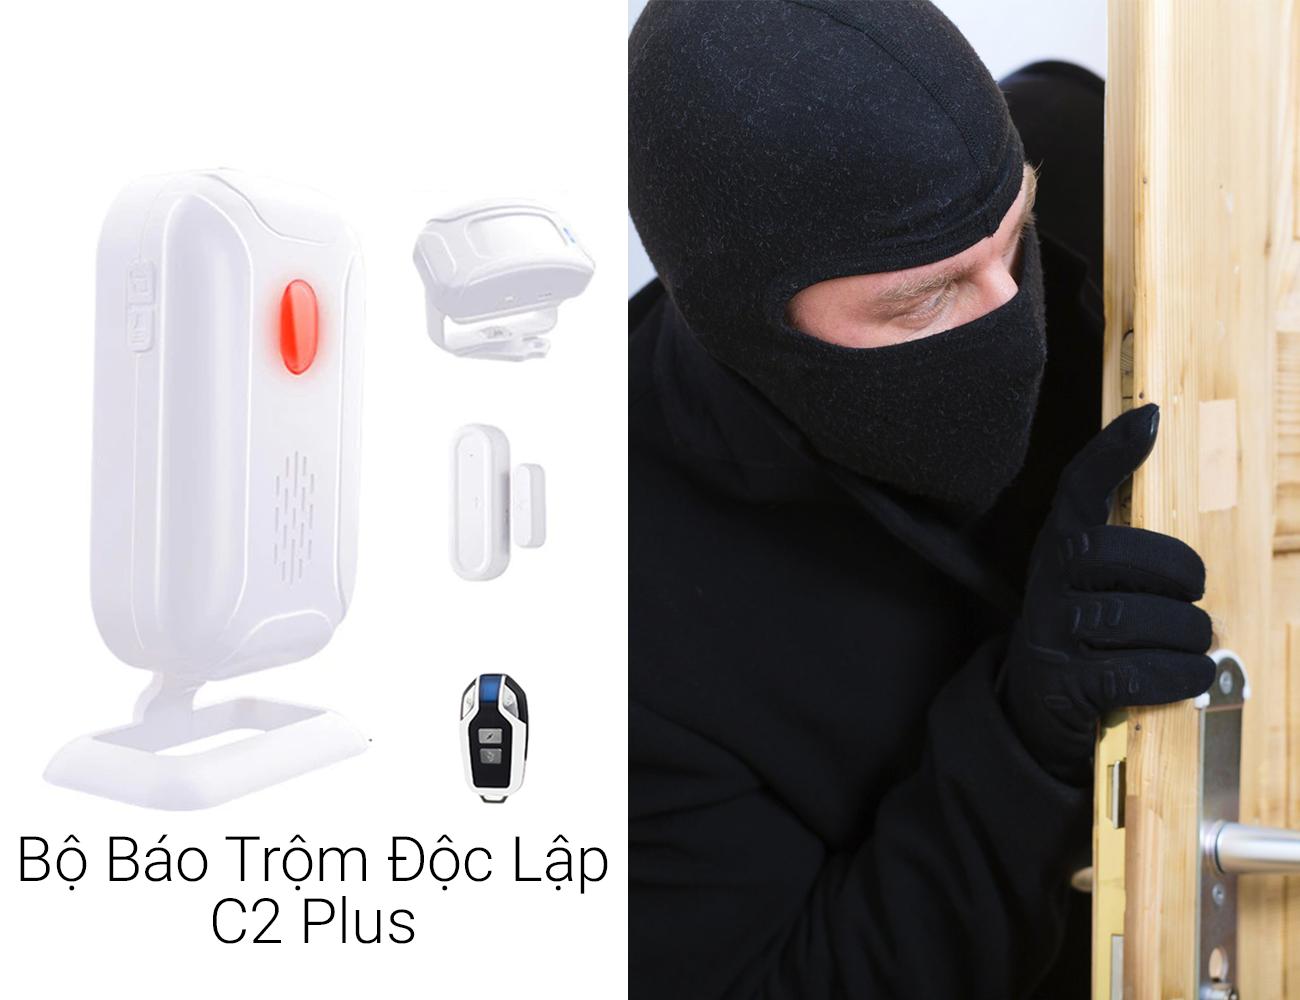 c2-plus-bao-dong-doc-lap